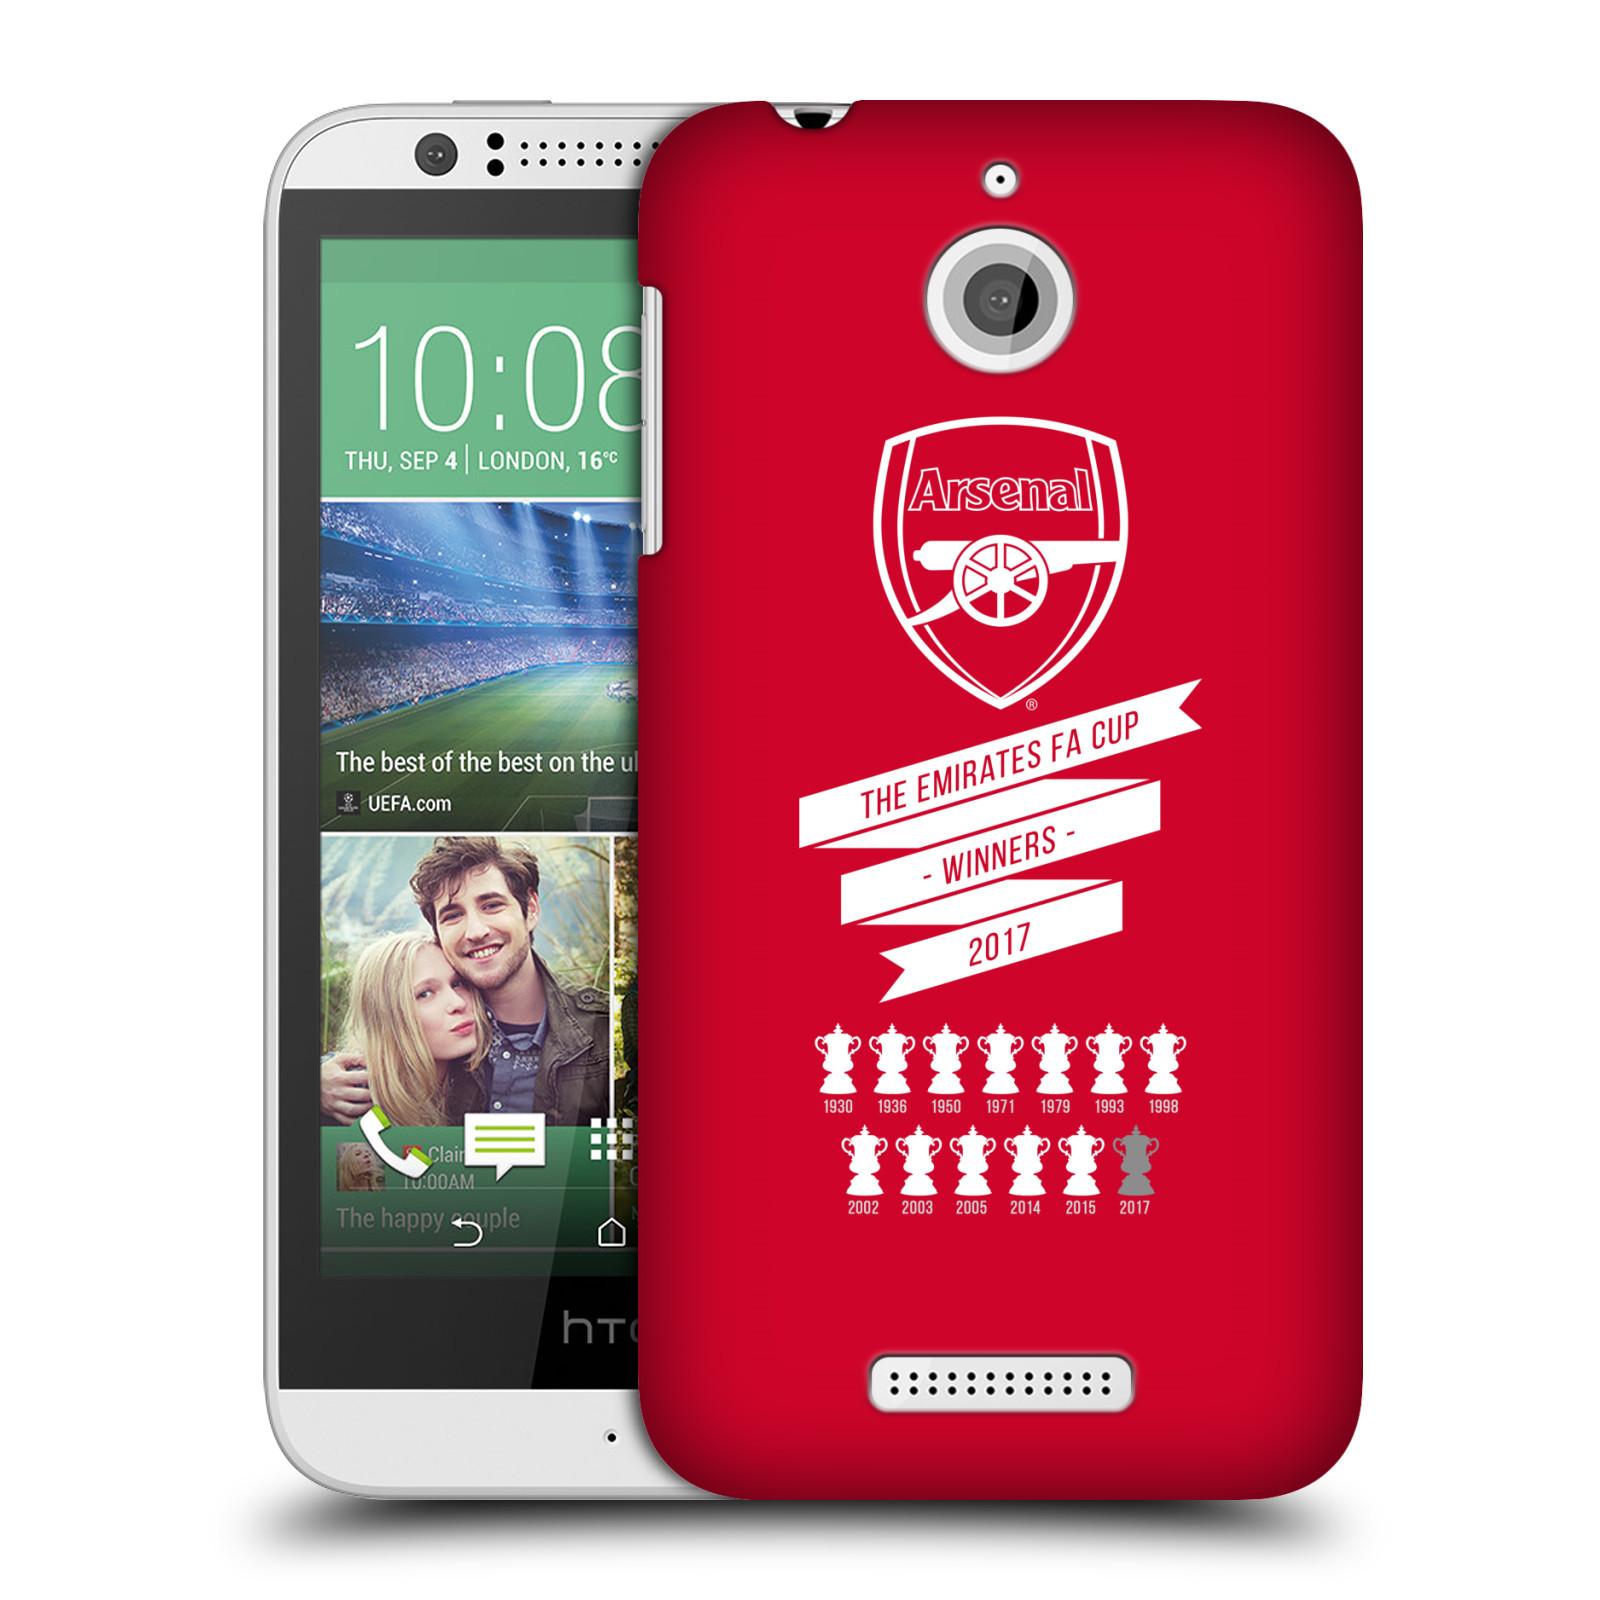 Plastové pouzdro na mobil HTC Desire 510 - Head Case - Arsenal FC - 13 Wins